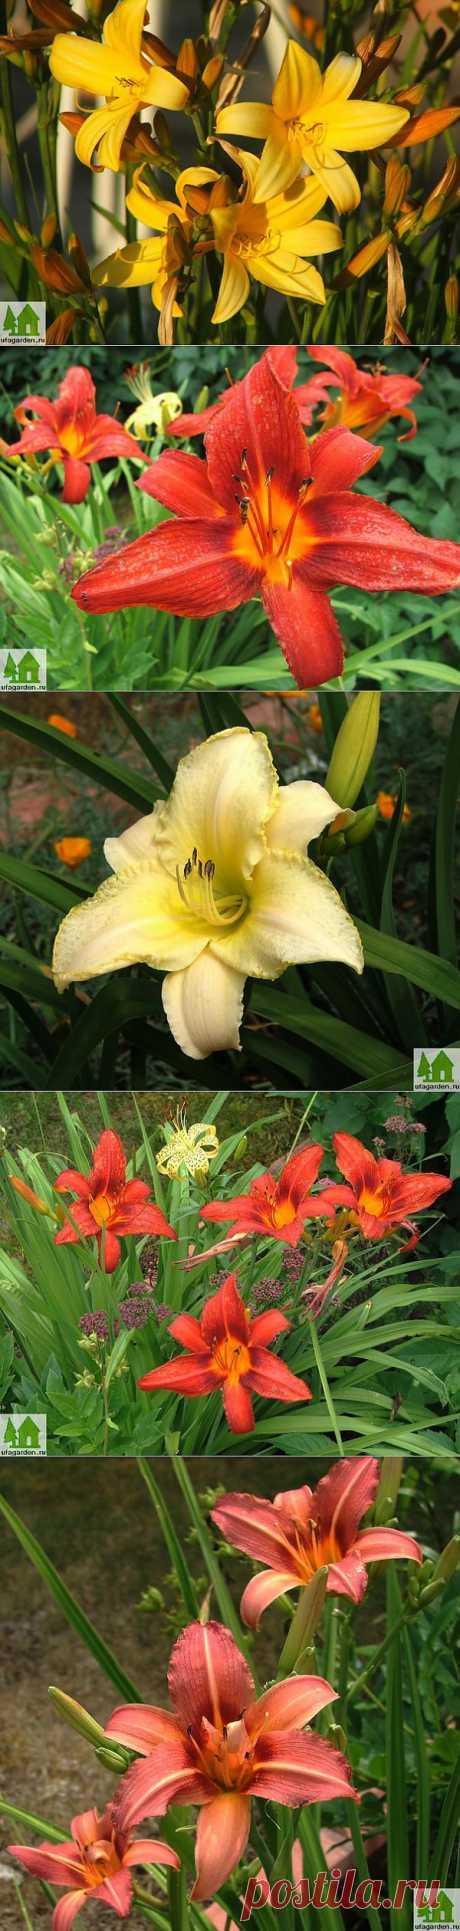 Лилейники фото | Дачная жизнь - сад, огород, дача